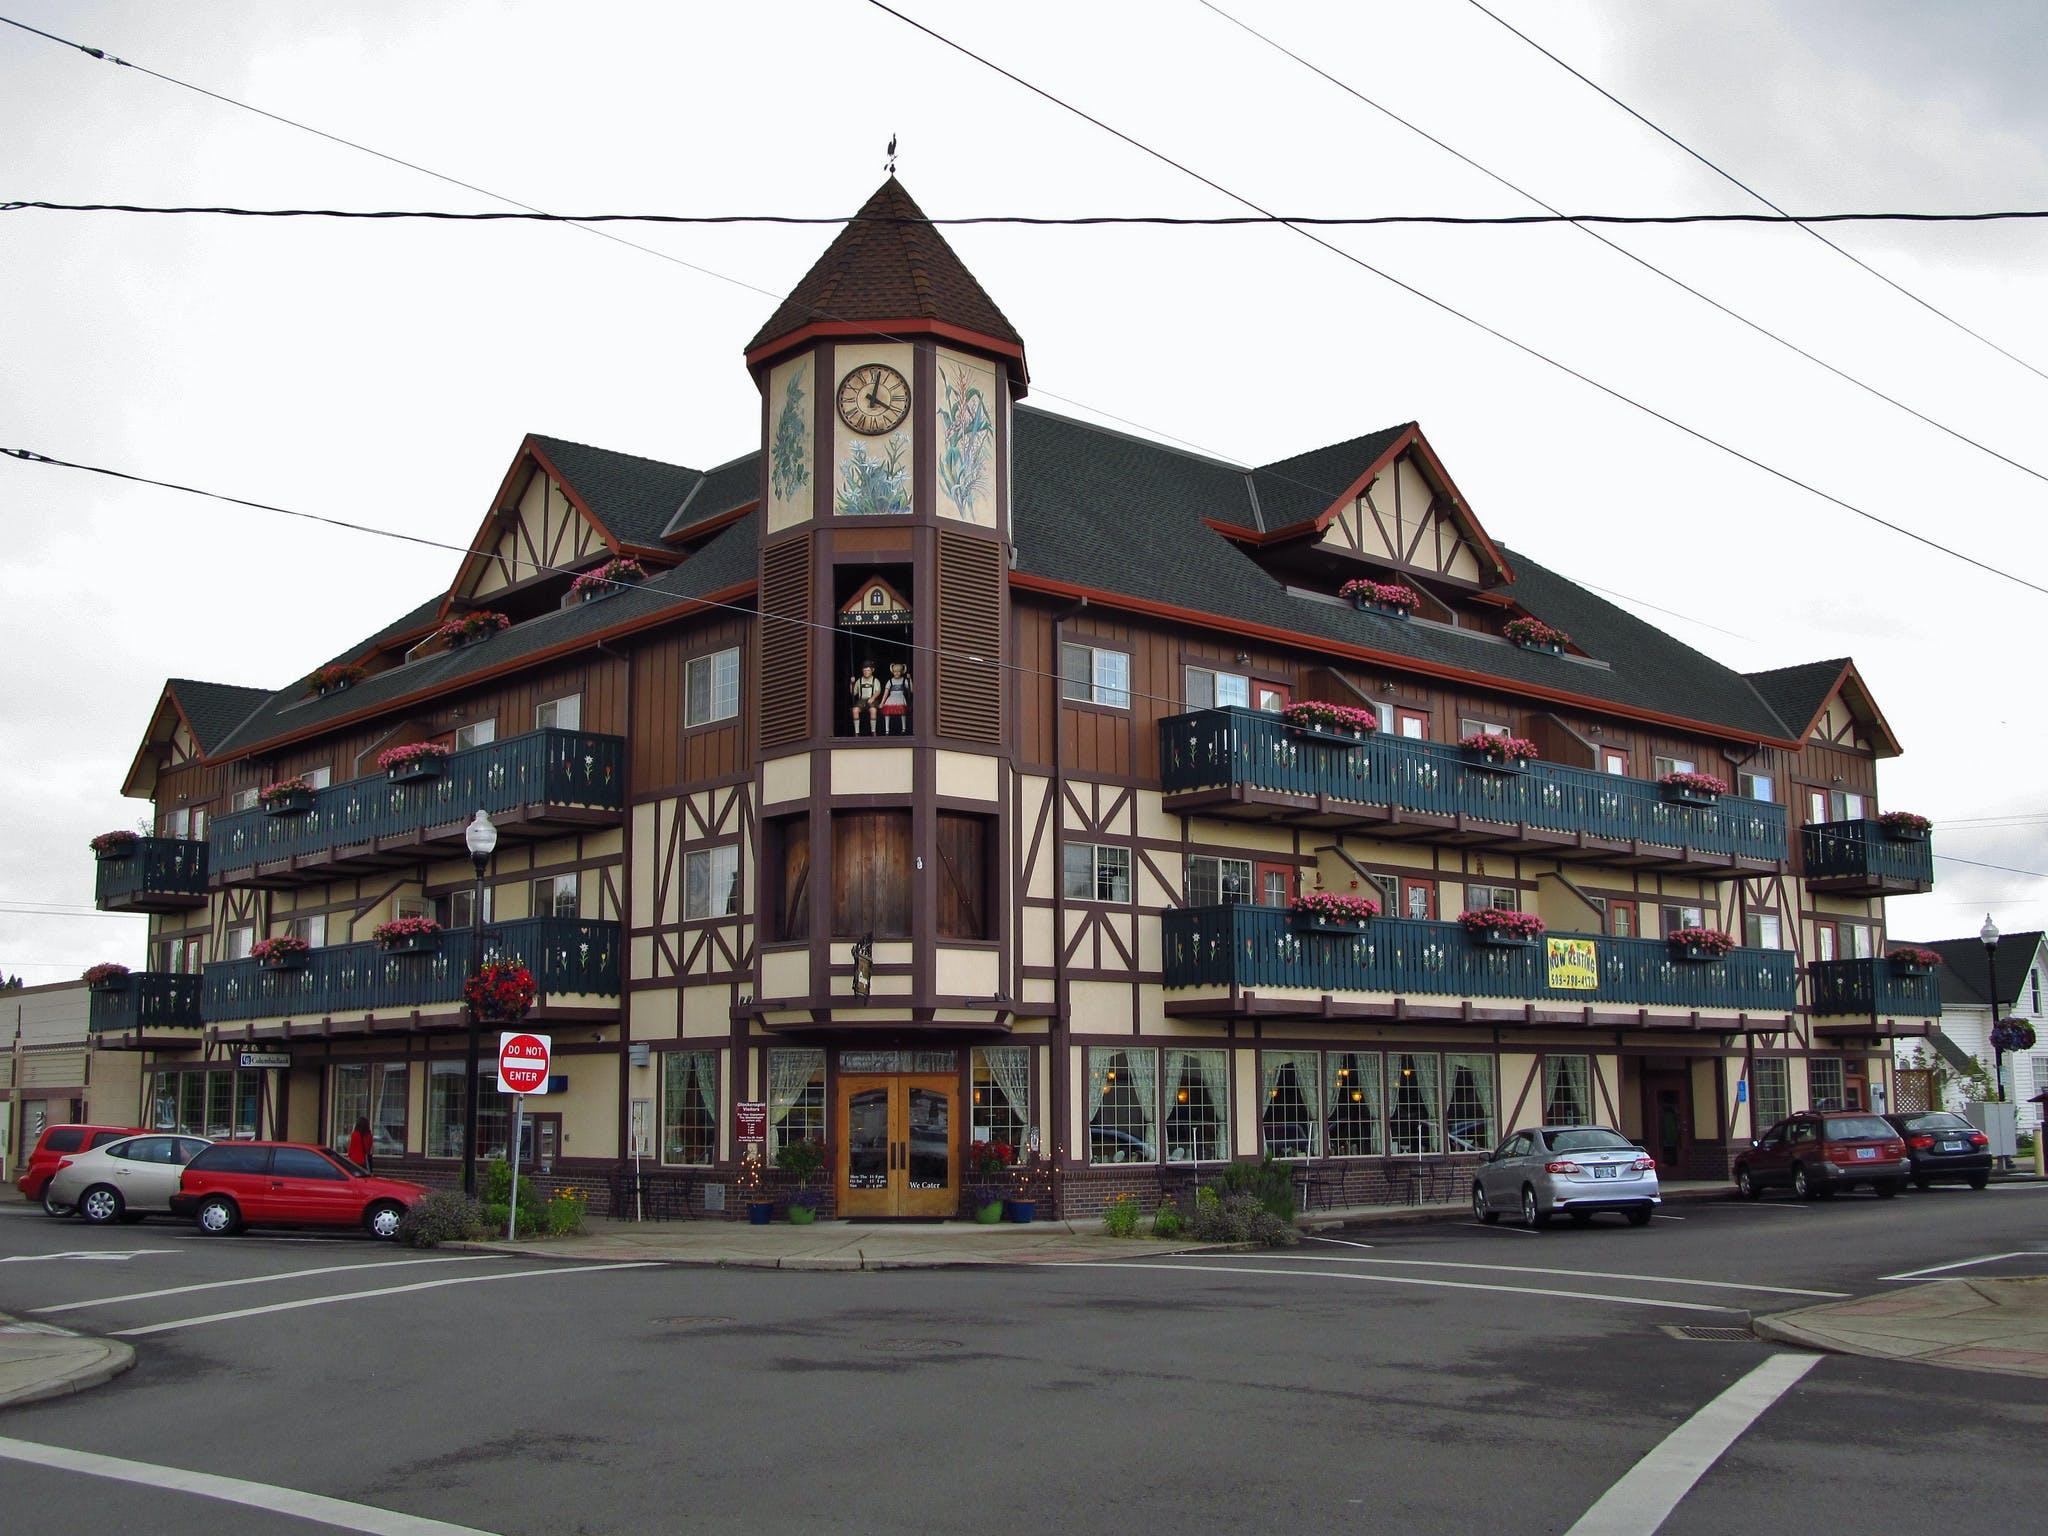 The Glockenspiel restaurant in Mount Angel, Oregon